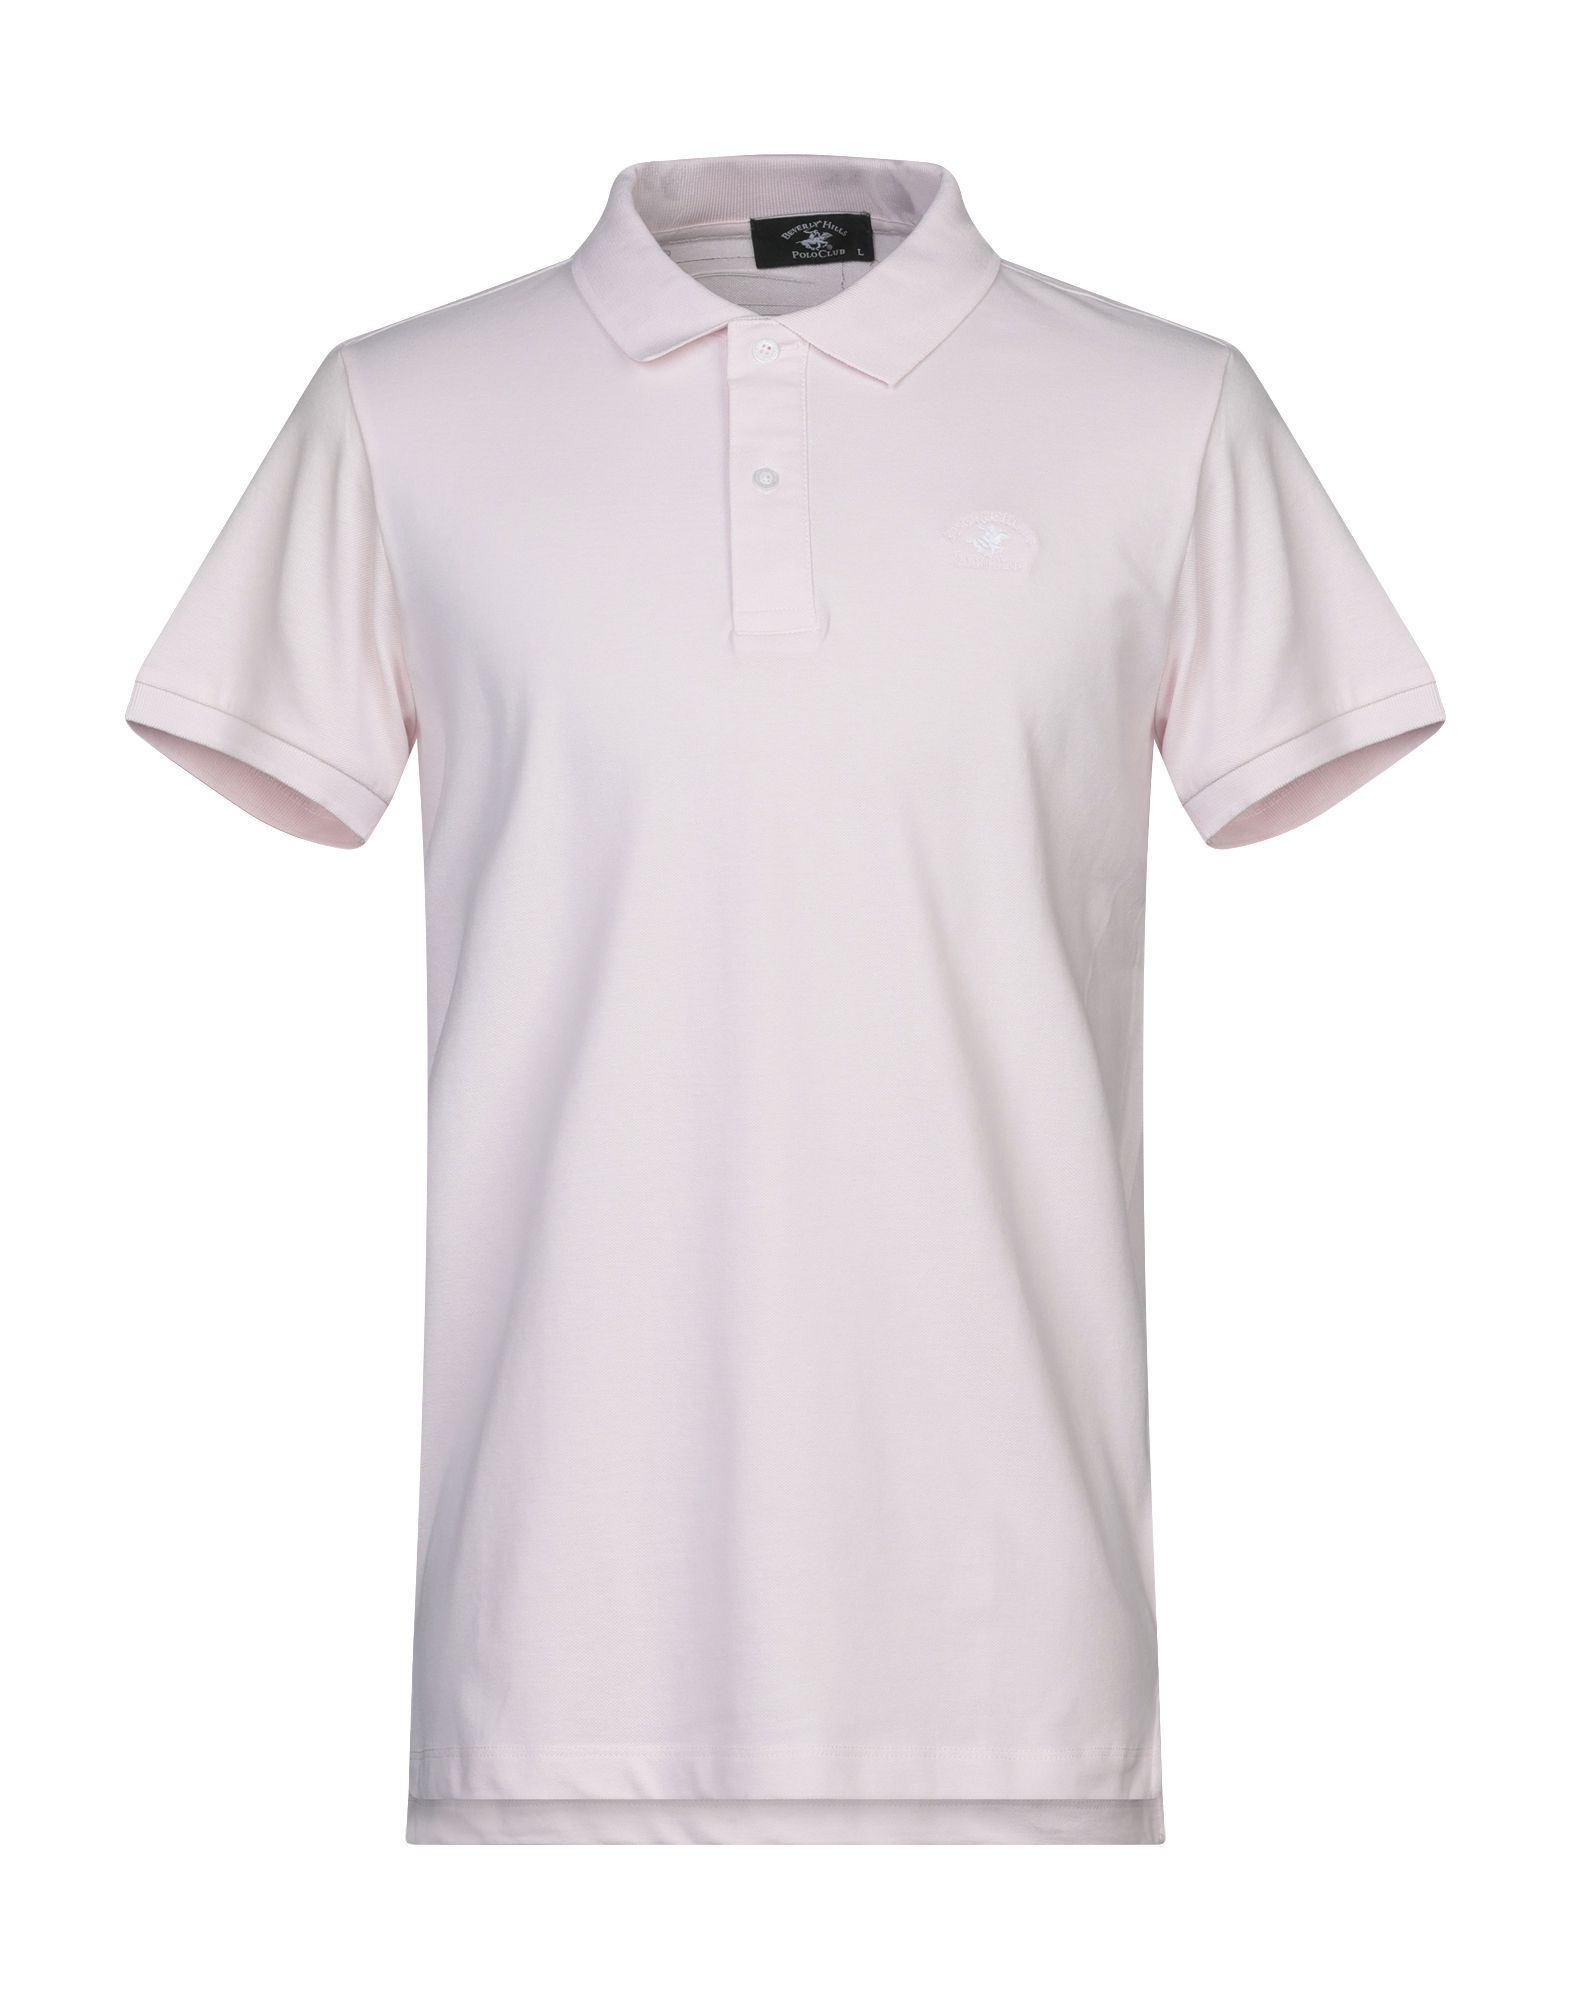 BEVERLY HILLS POLO CLUB Поло футболка поло polo club c h a футболки спортивные